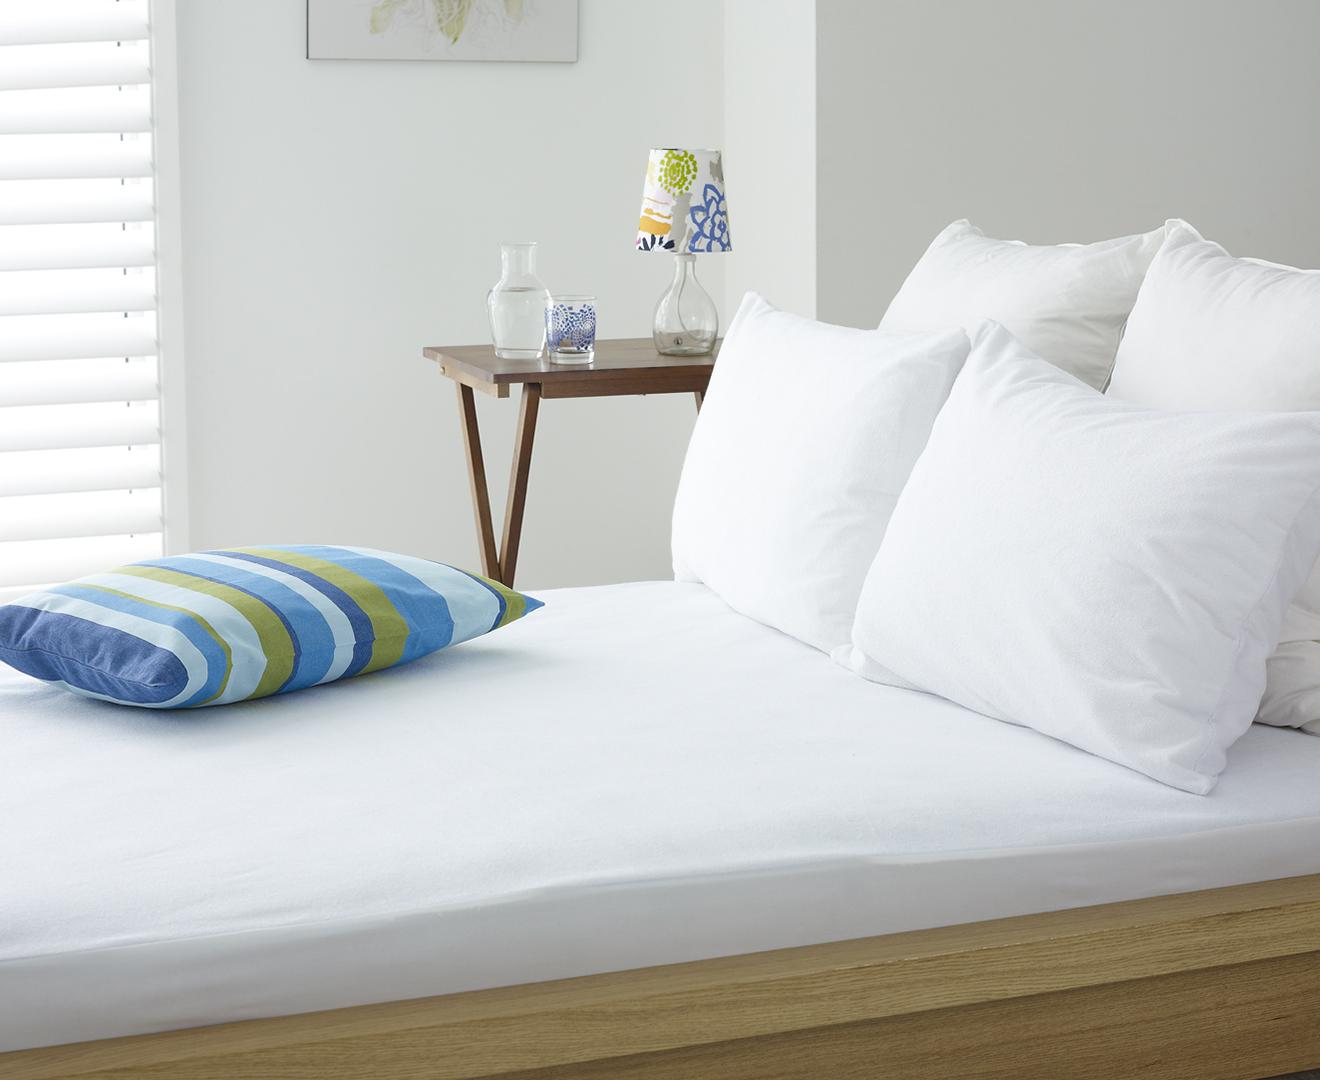 Sleep Comfort Fully Encased Waterproof Double Bed Mattress